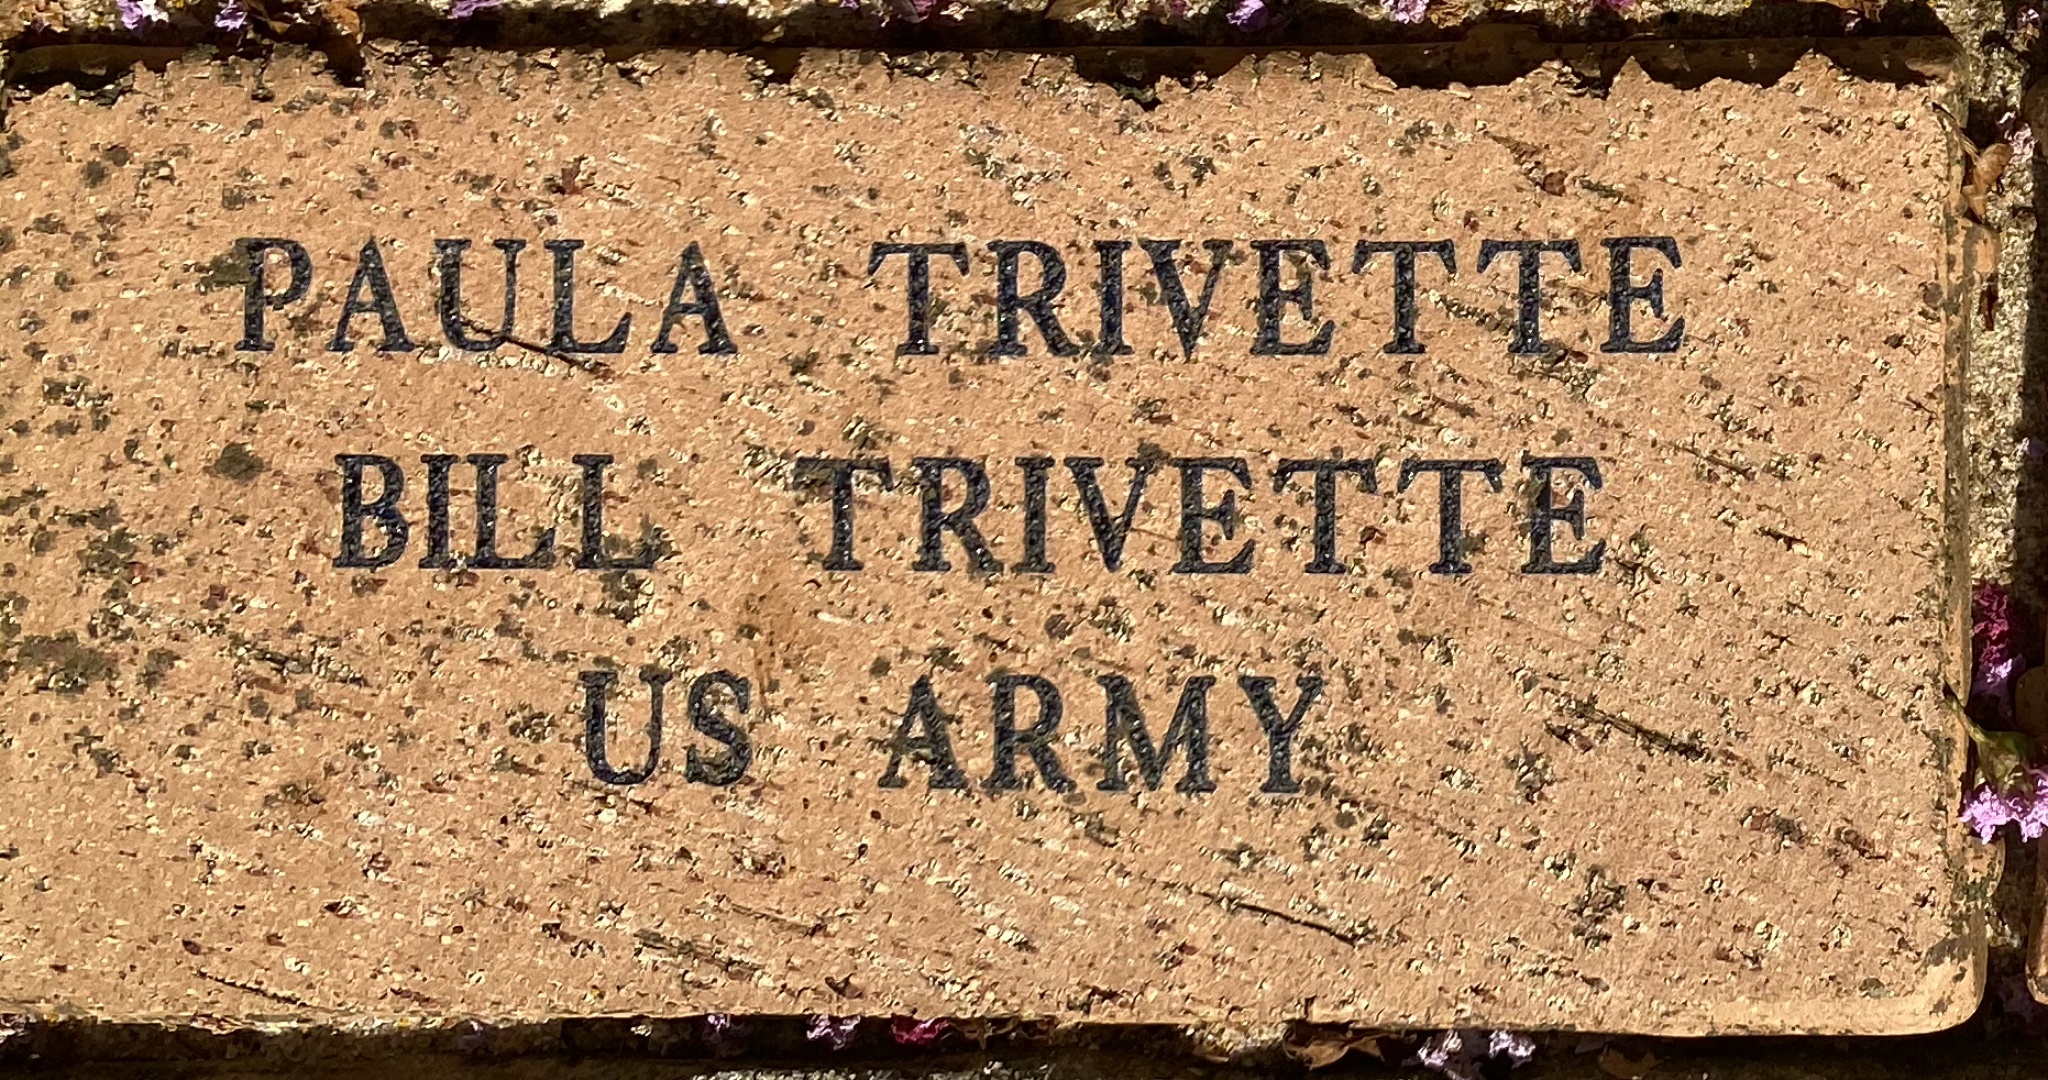 PAULA TRIVETTE BILL TRIVETTE US ARMY